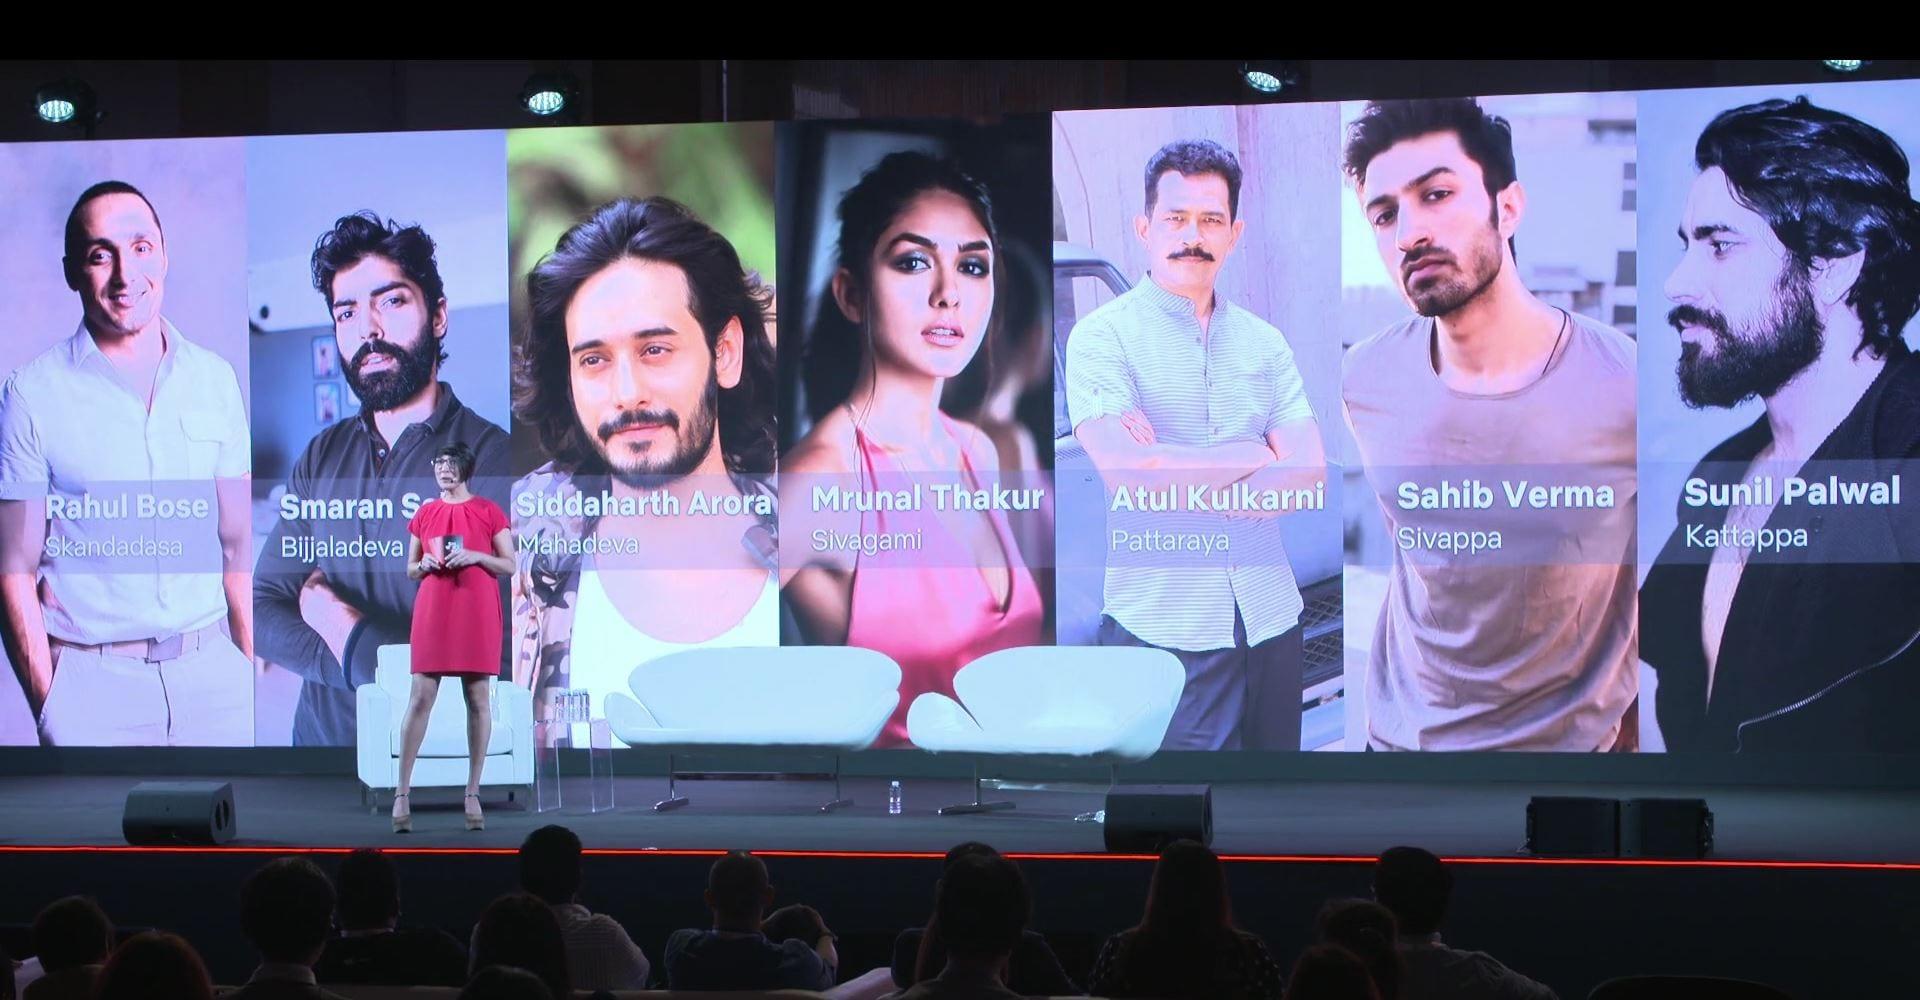 Netflix's Baahubali Casts Rahul Bose, Mrunal Thakur, Atul Kulkarni, More